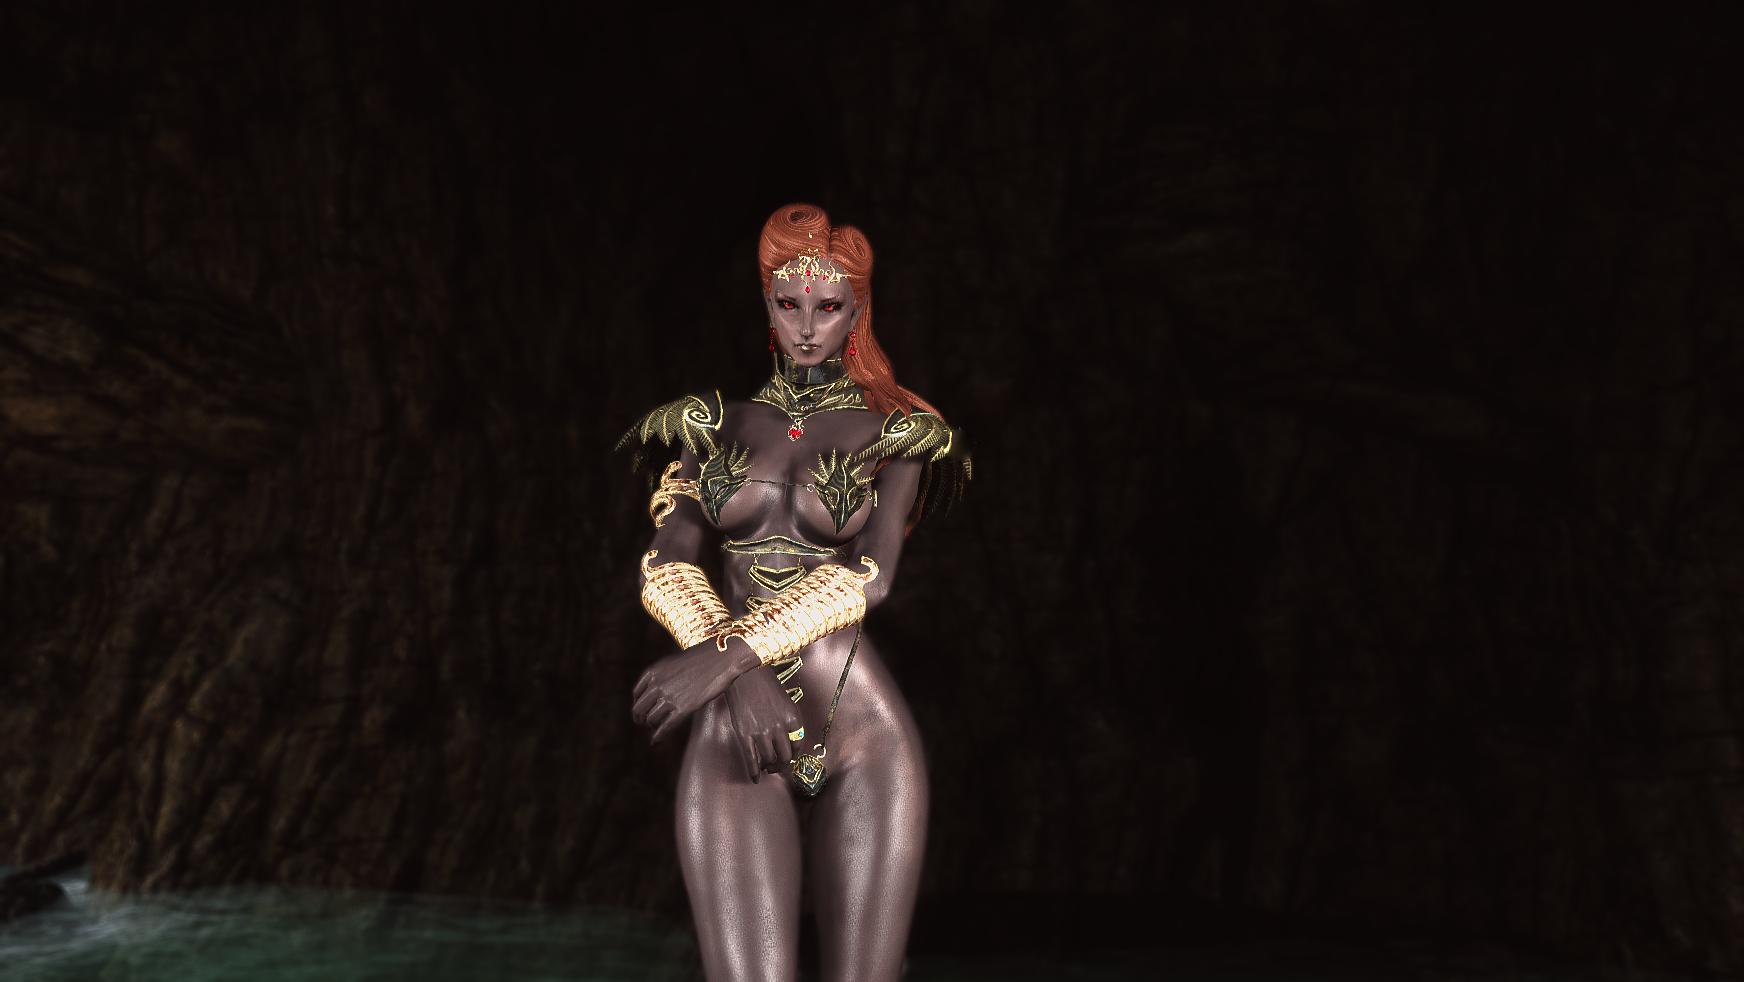 Tes V - Skyrim Screenshot 2019.05.21 - 19.30.59.64.png - Elder Scrolls 5: Skyrim, the